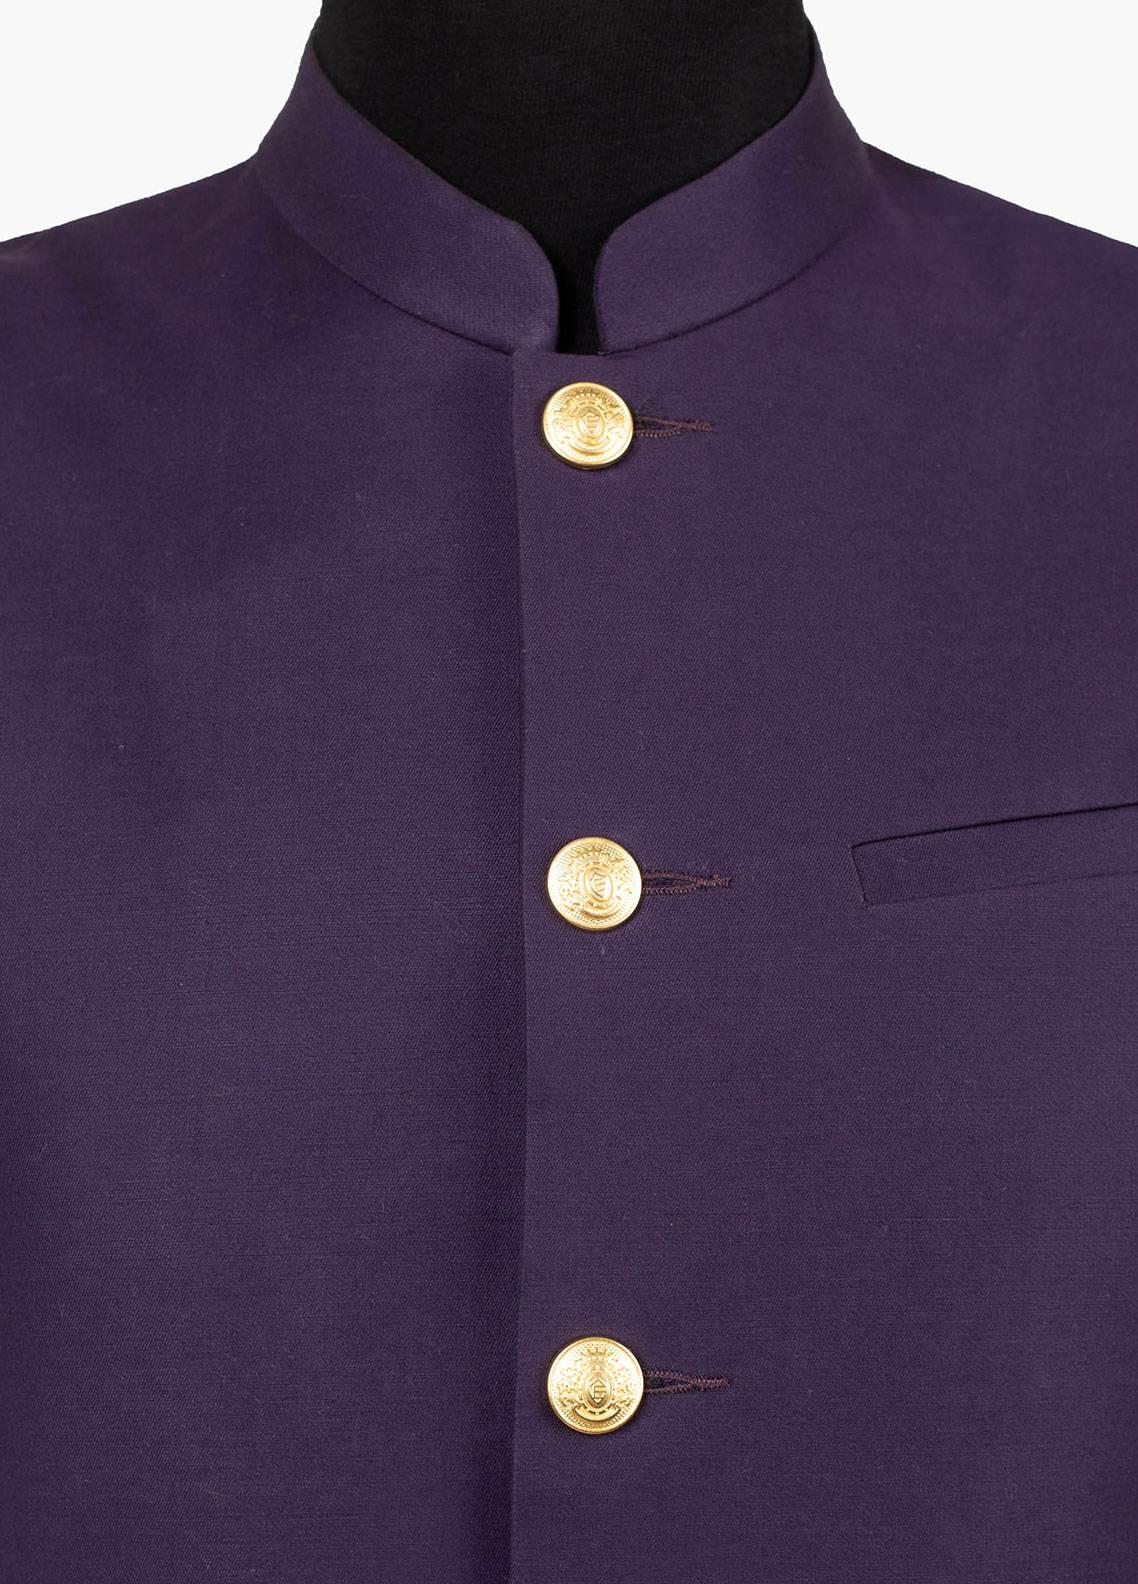 Brumano Cotton Formal Men Waistcoat - Purple BRM-511-B